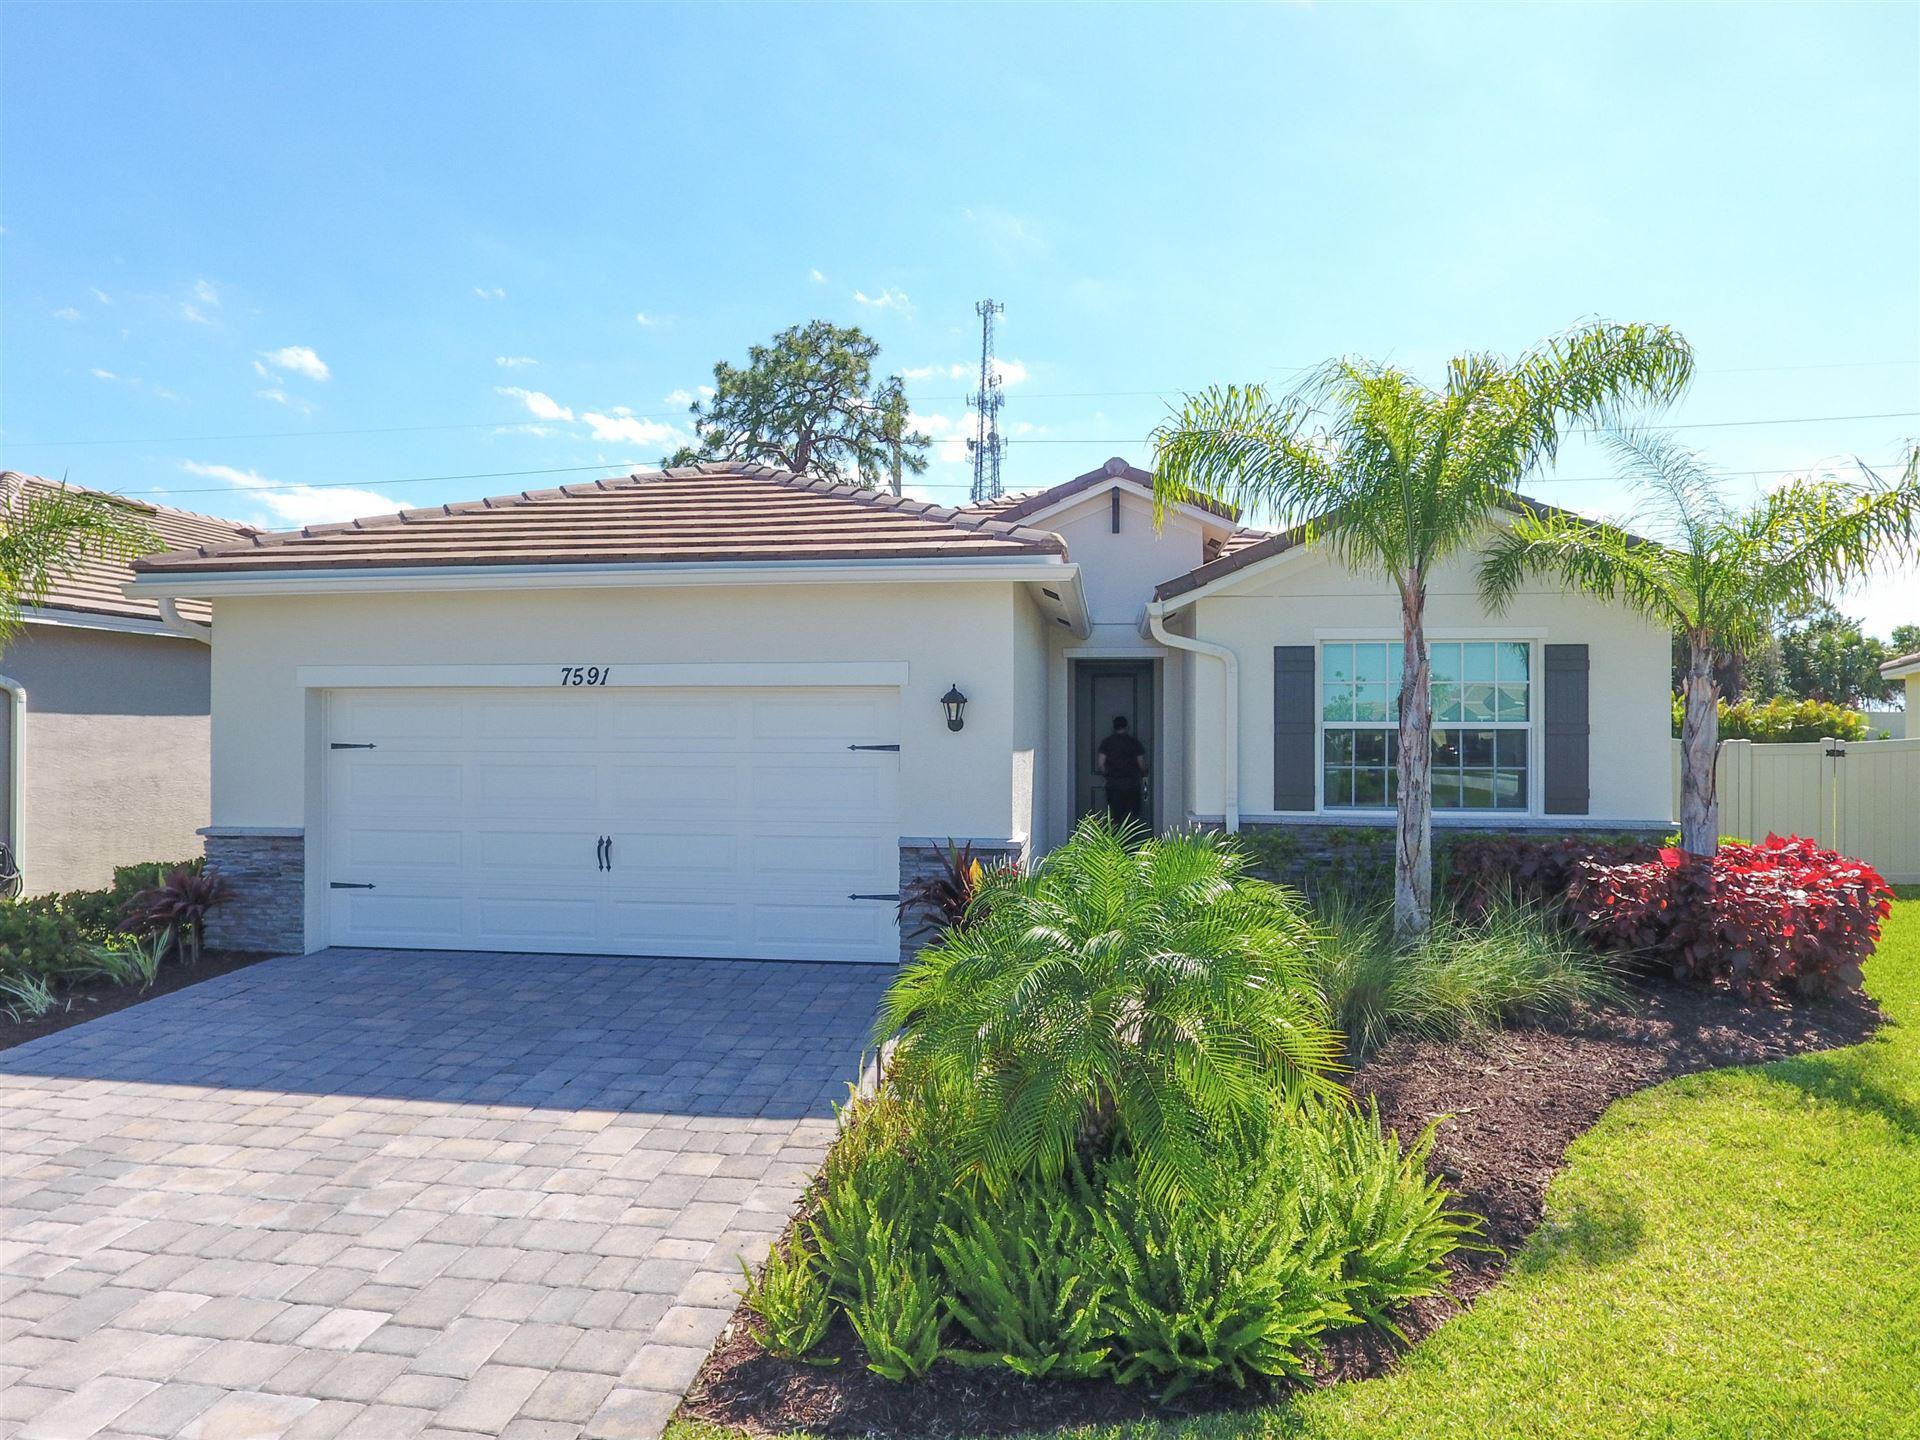 7591 SW Harbor Cove Drive, Stuart, FL 34997 - #: RX-10685014